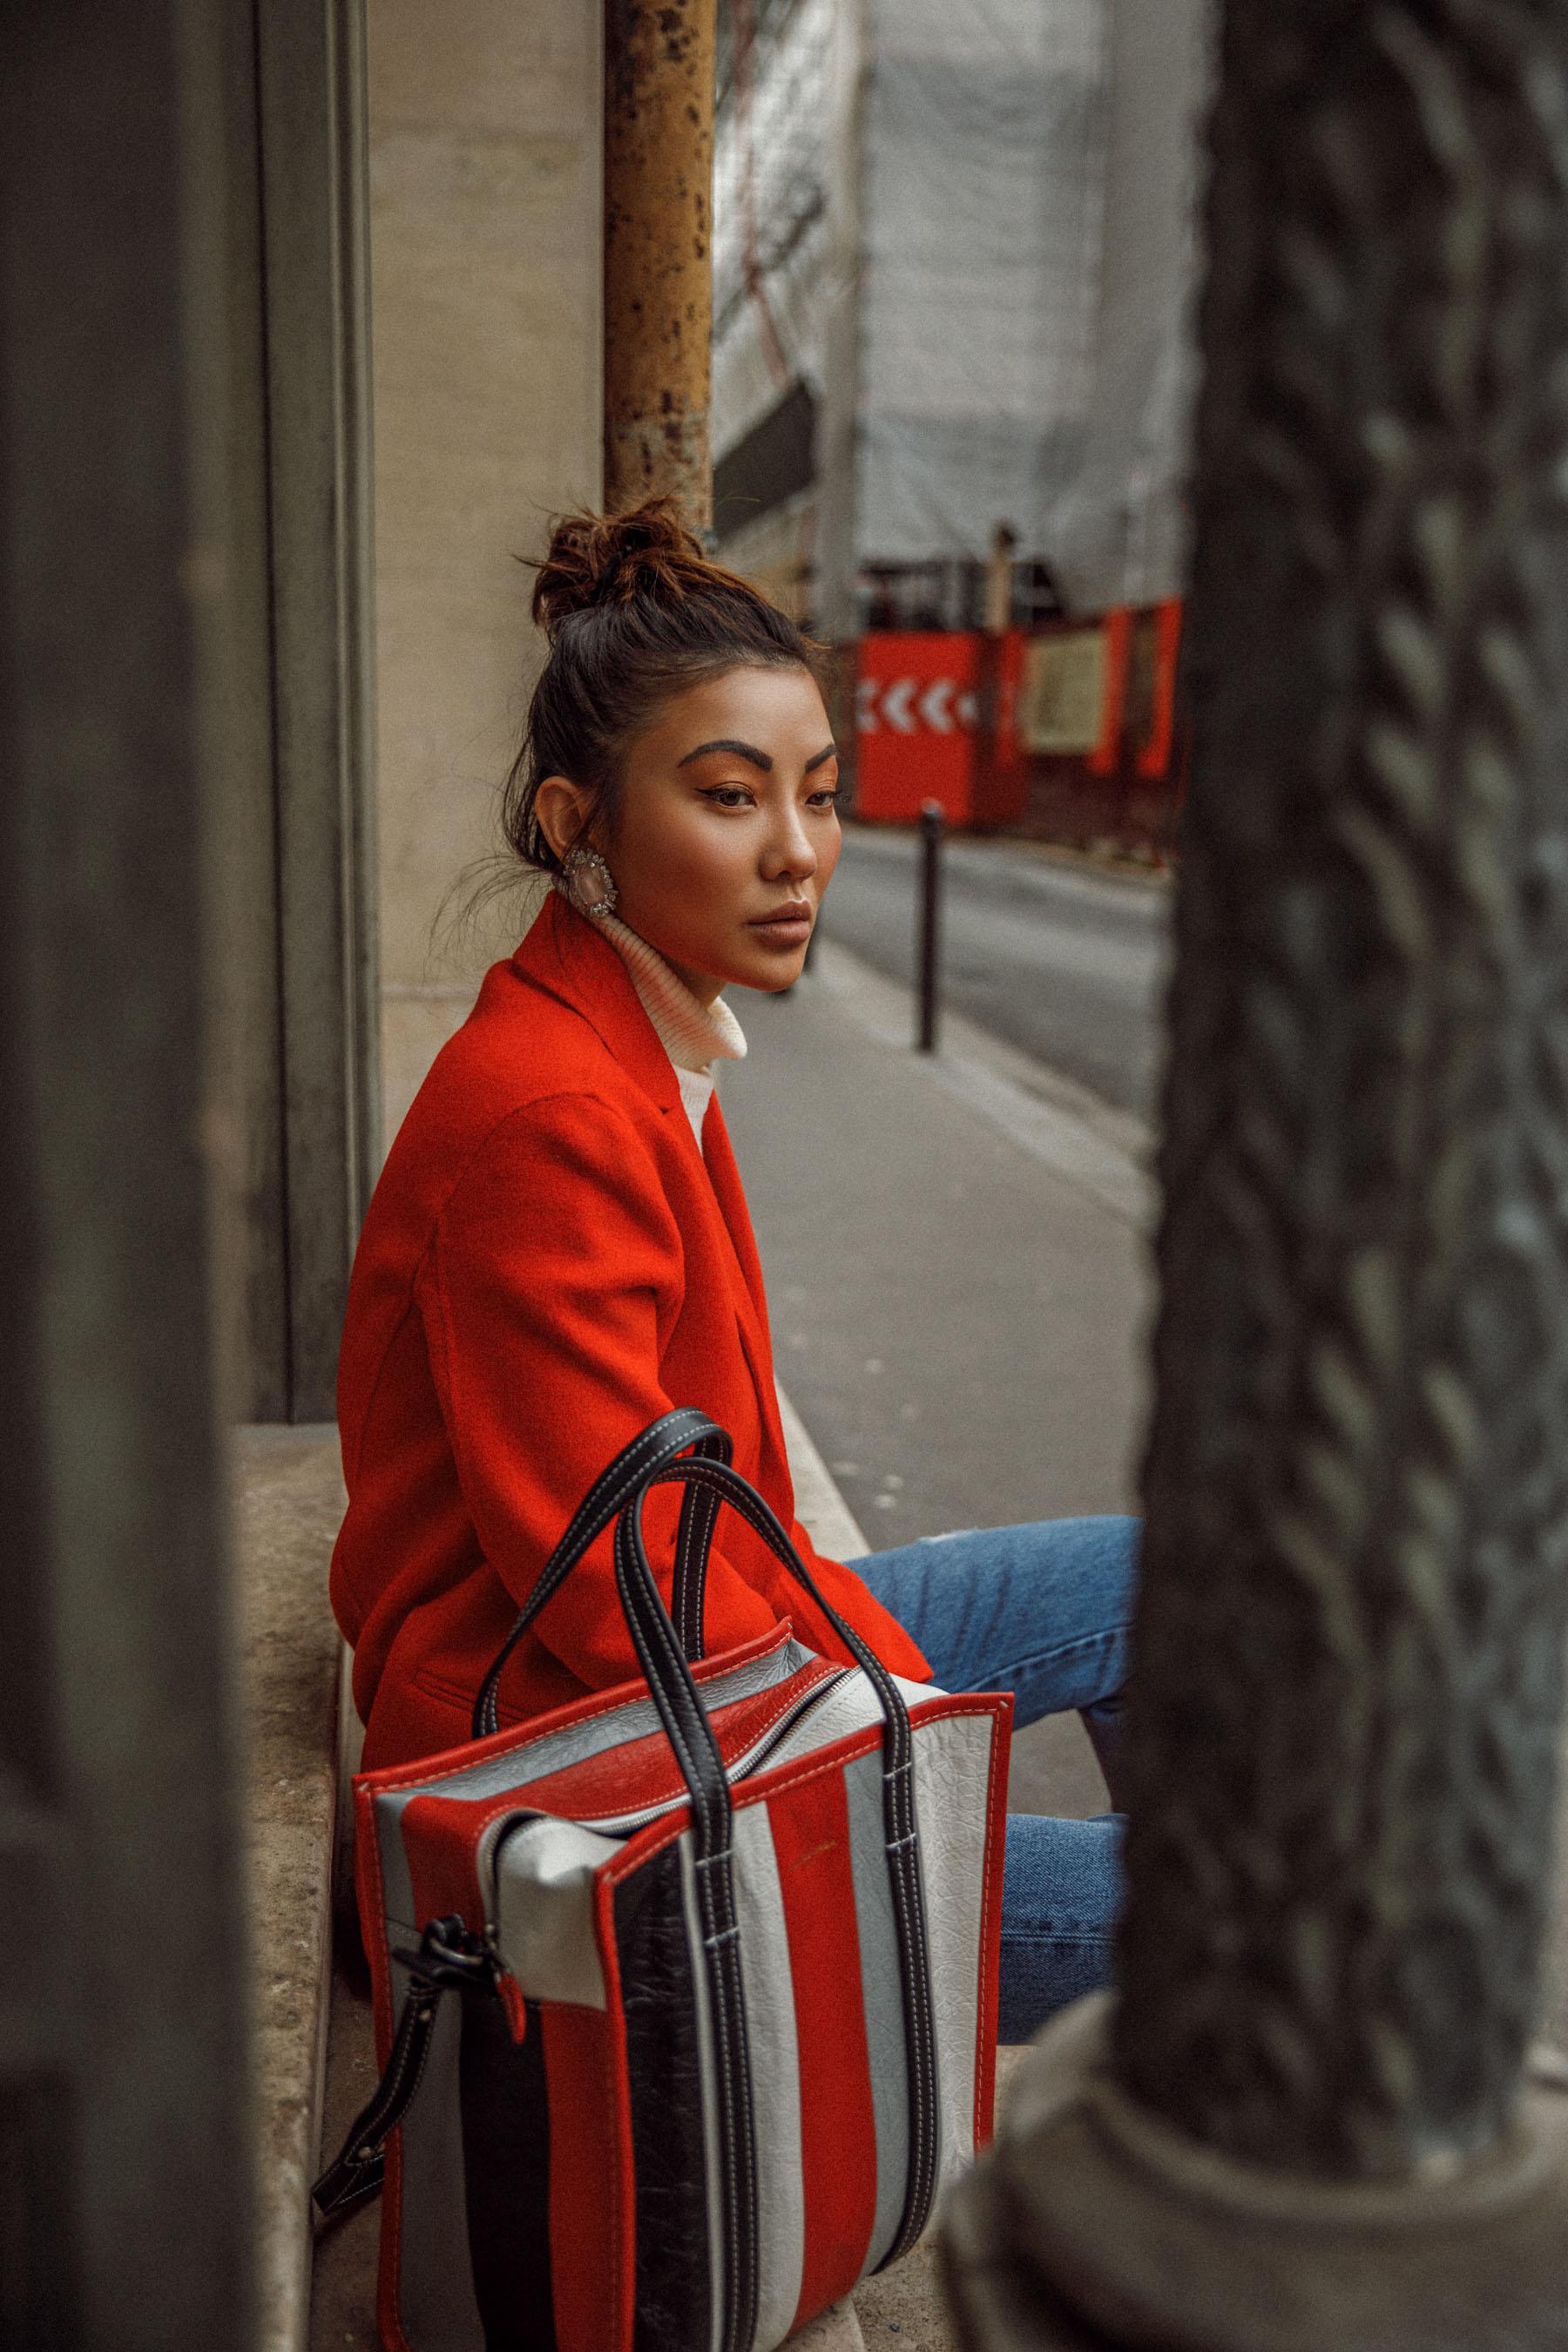 Winter Trends You Can Still Wear In Spring - Bright red coat, cuffed jeans, balenciaga bazar shopper, jessica wang in paris, pfw street style, eiffel tower photo // Notjessfashion.com